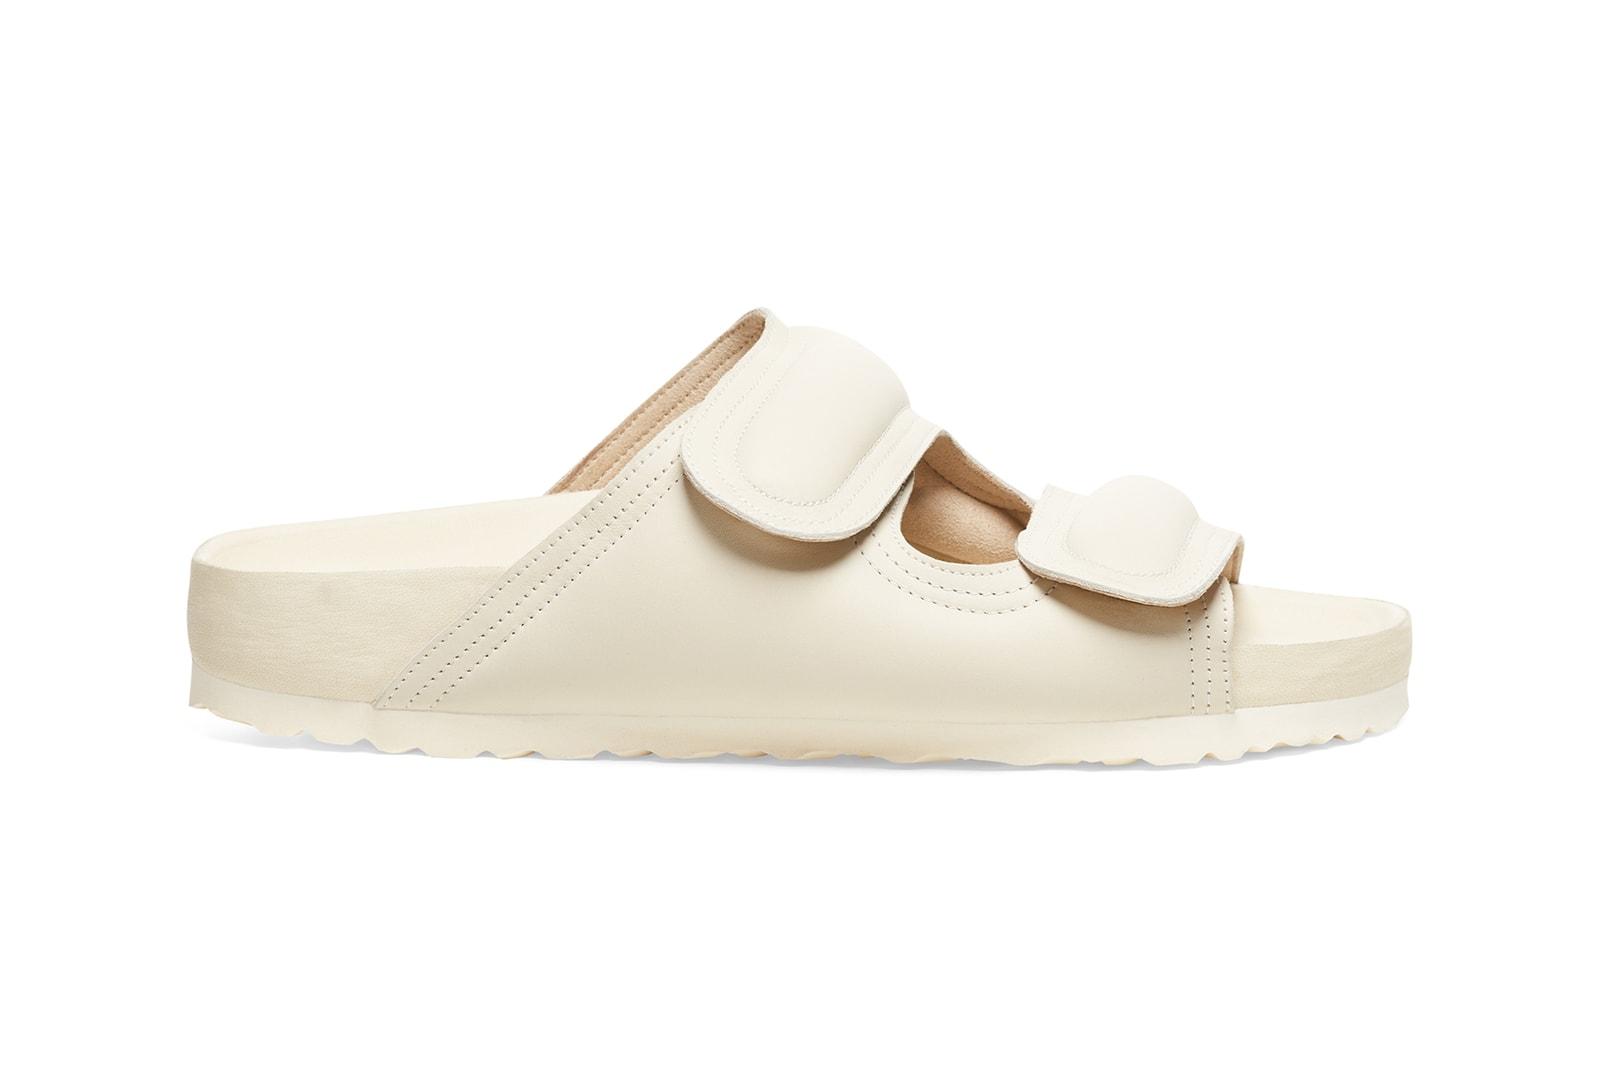 birkenstock too good spring summer collaboration forager mudlark beachcomber sandals apparel bed